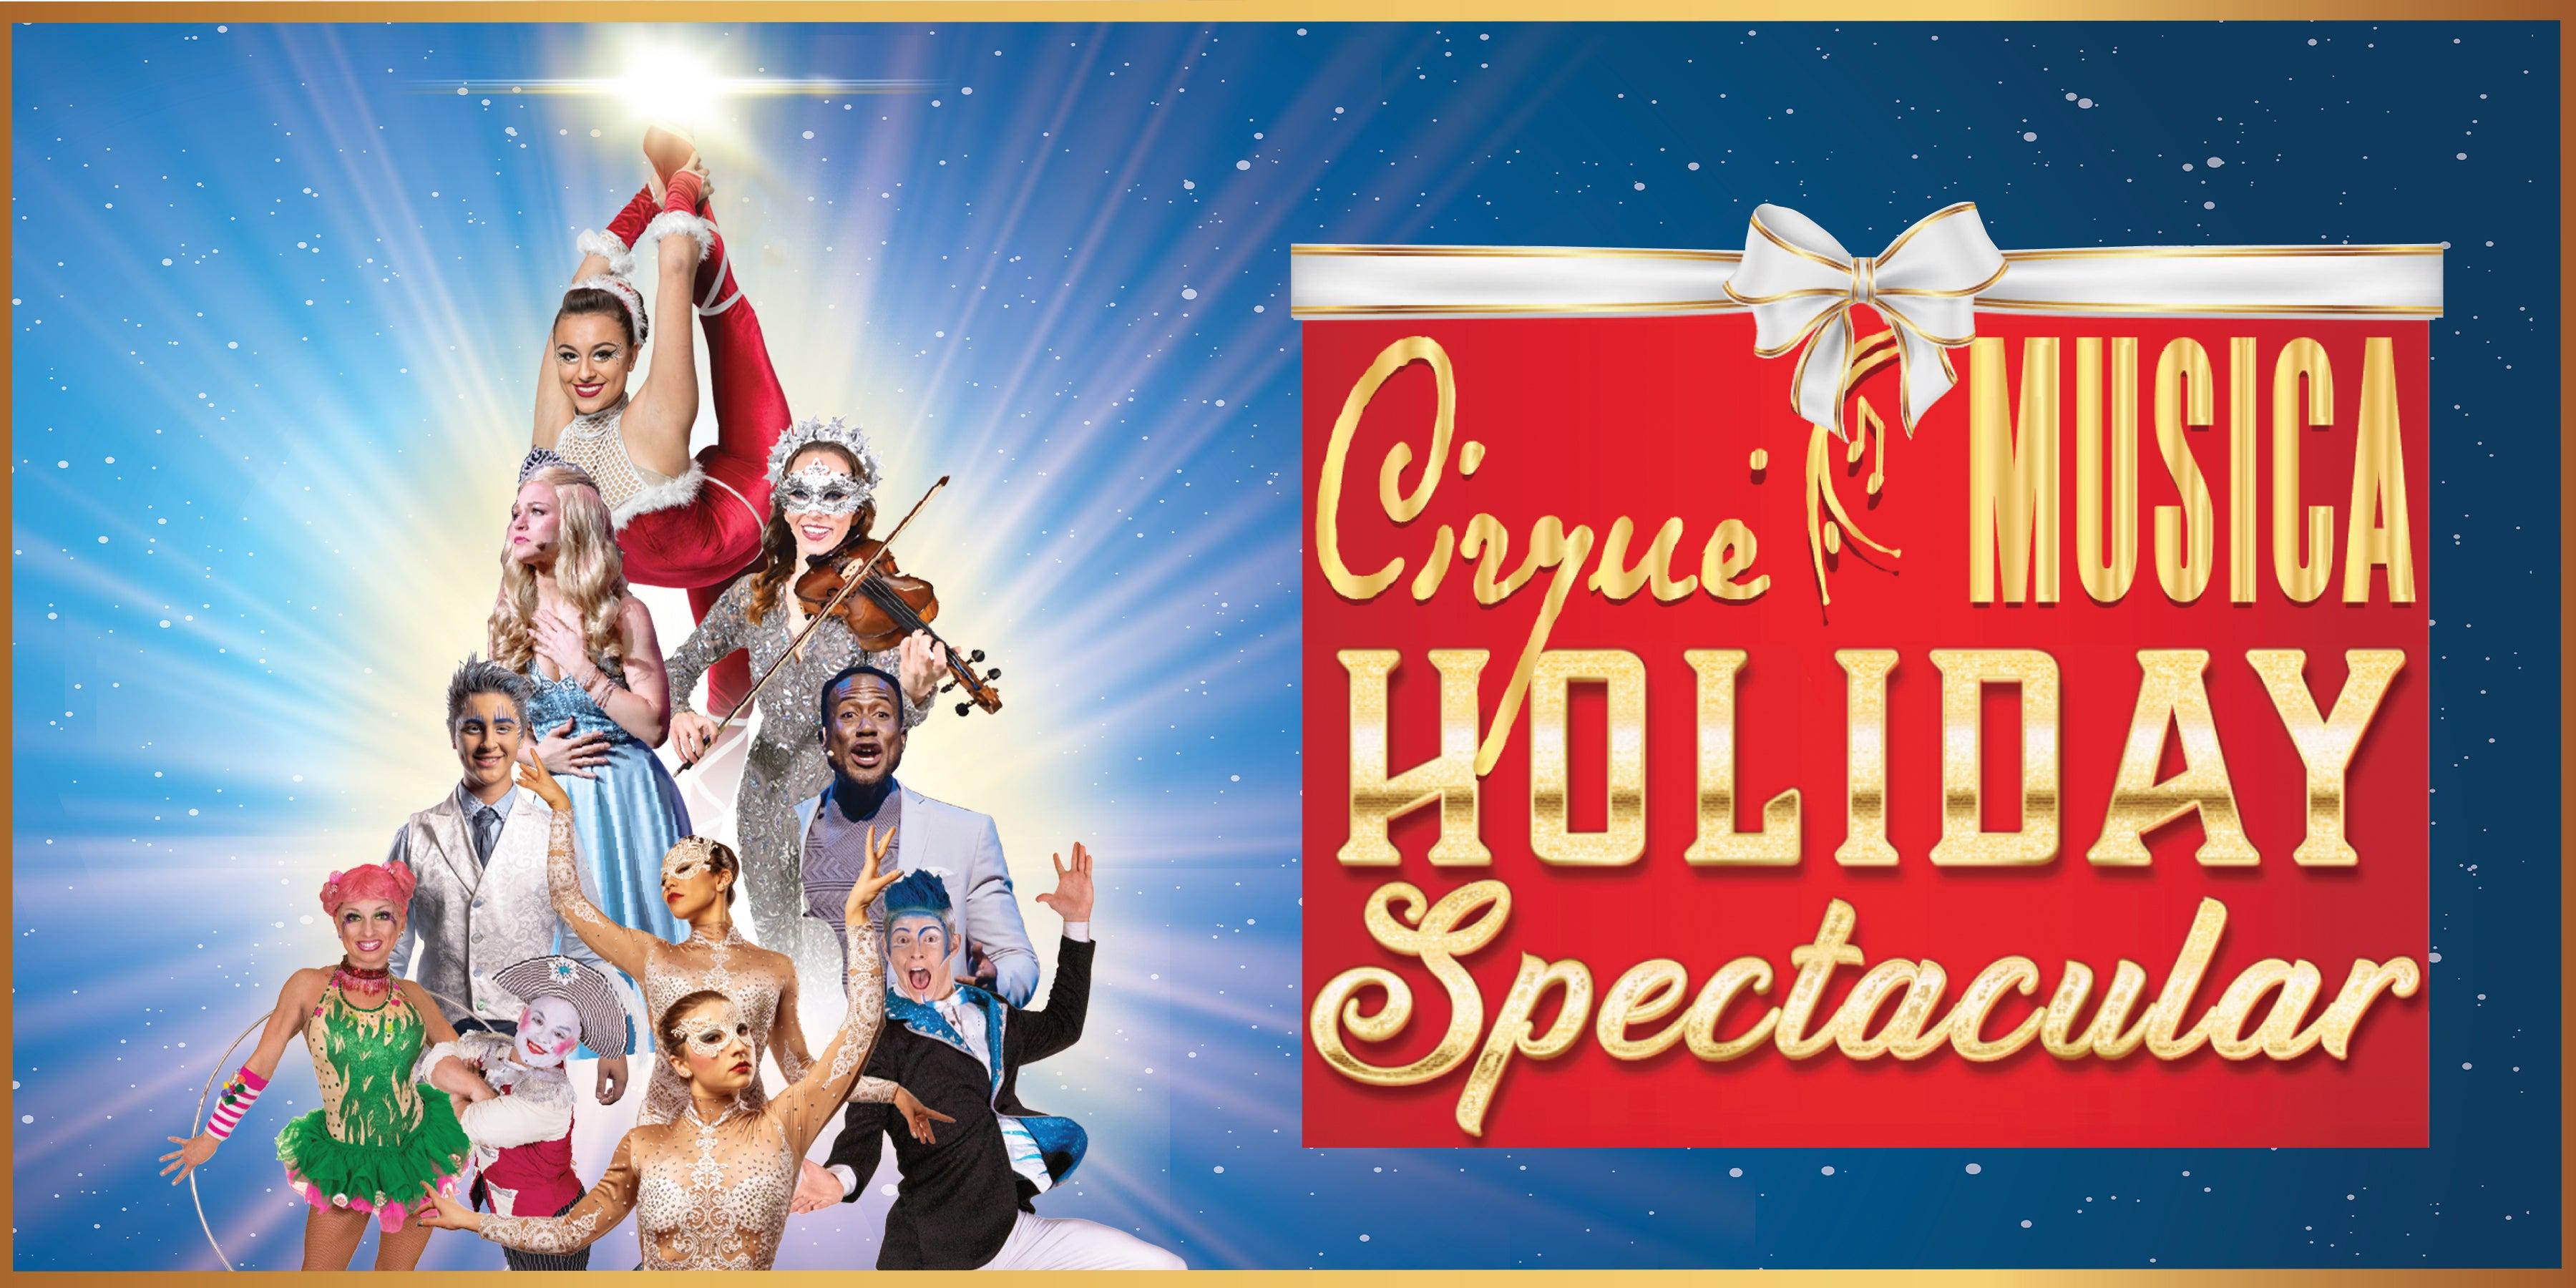 More Info for Cirque Musica Holiday Spectacular